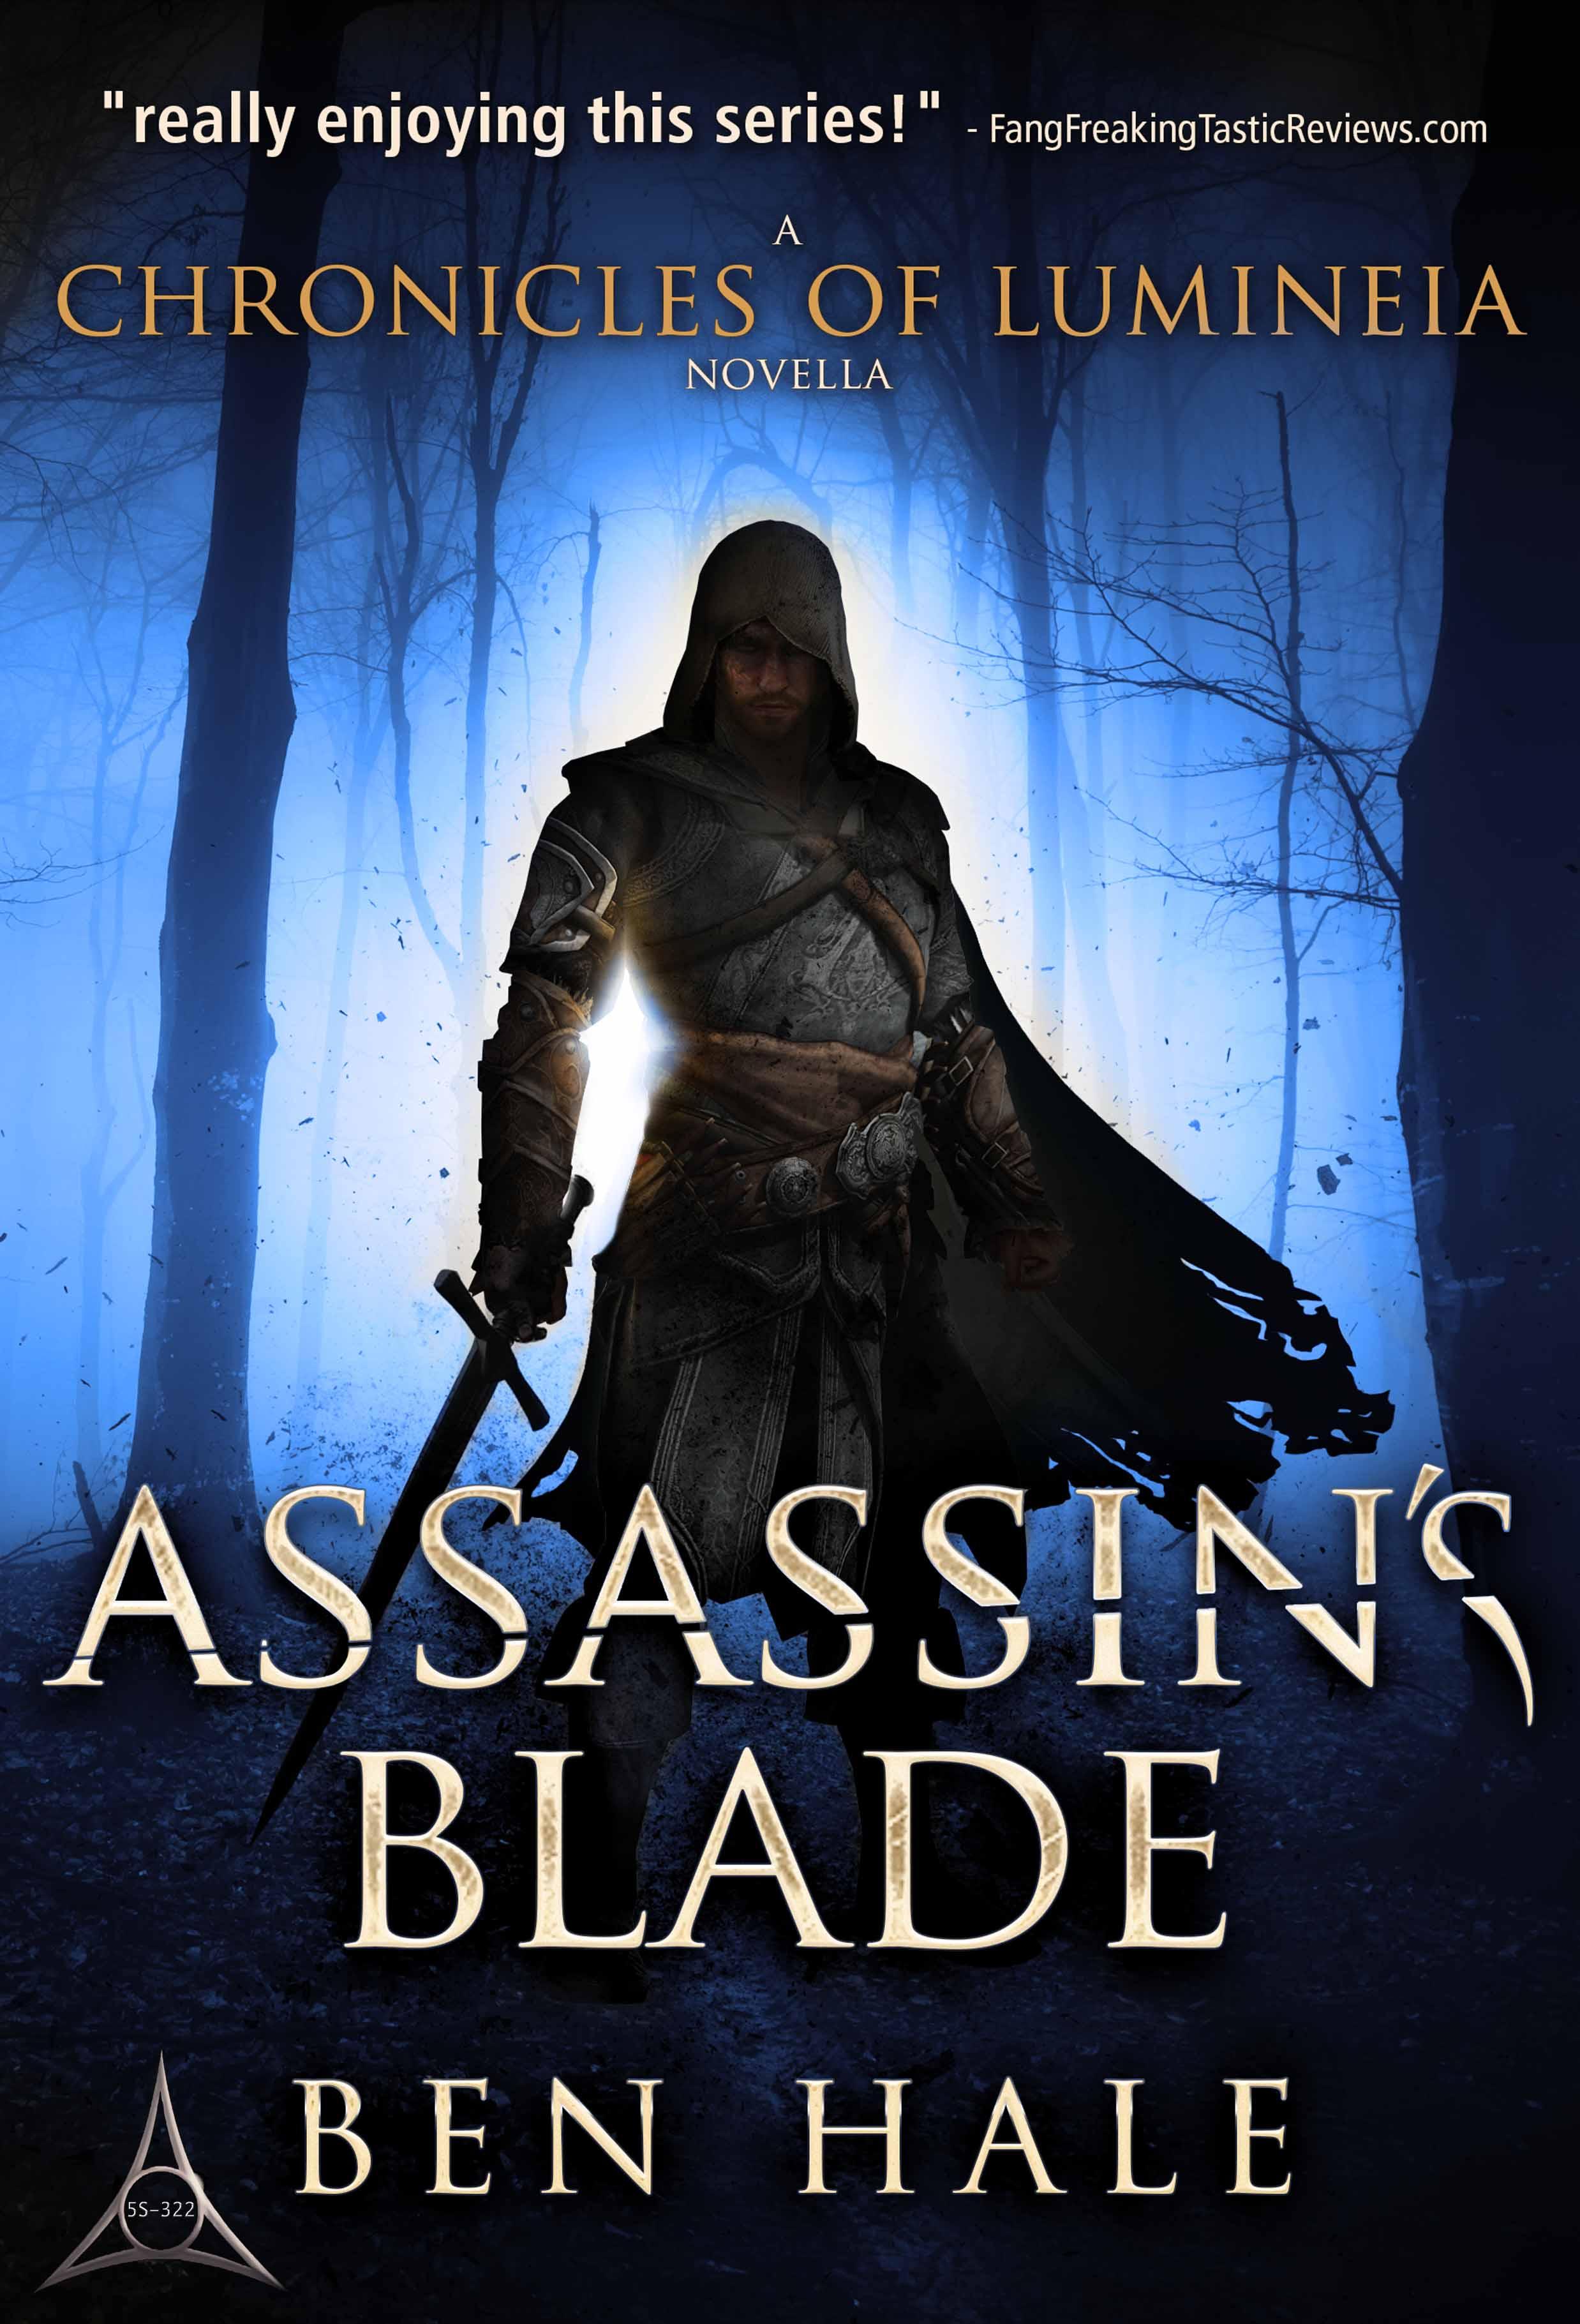 Assassin's Blade low res.jpg